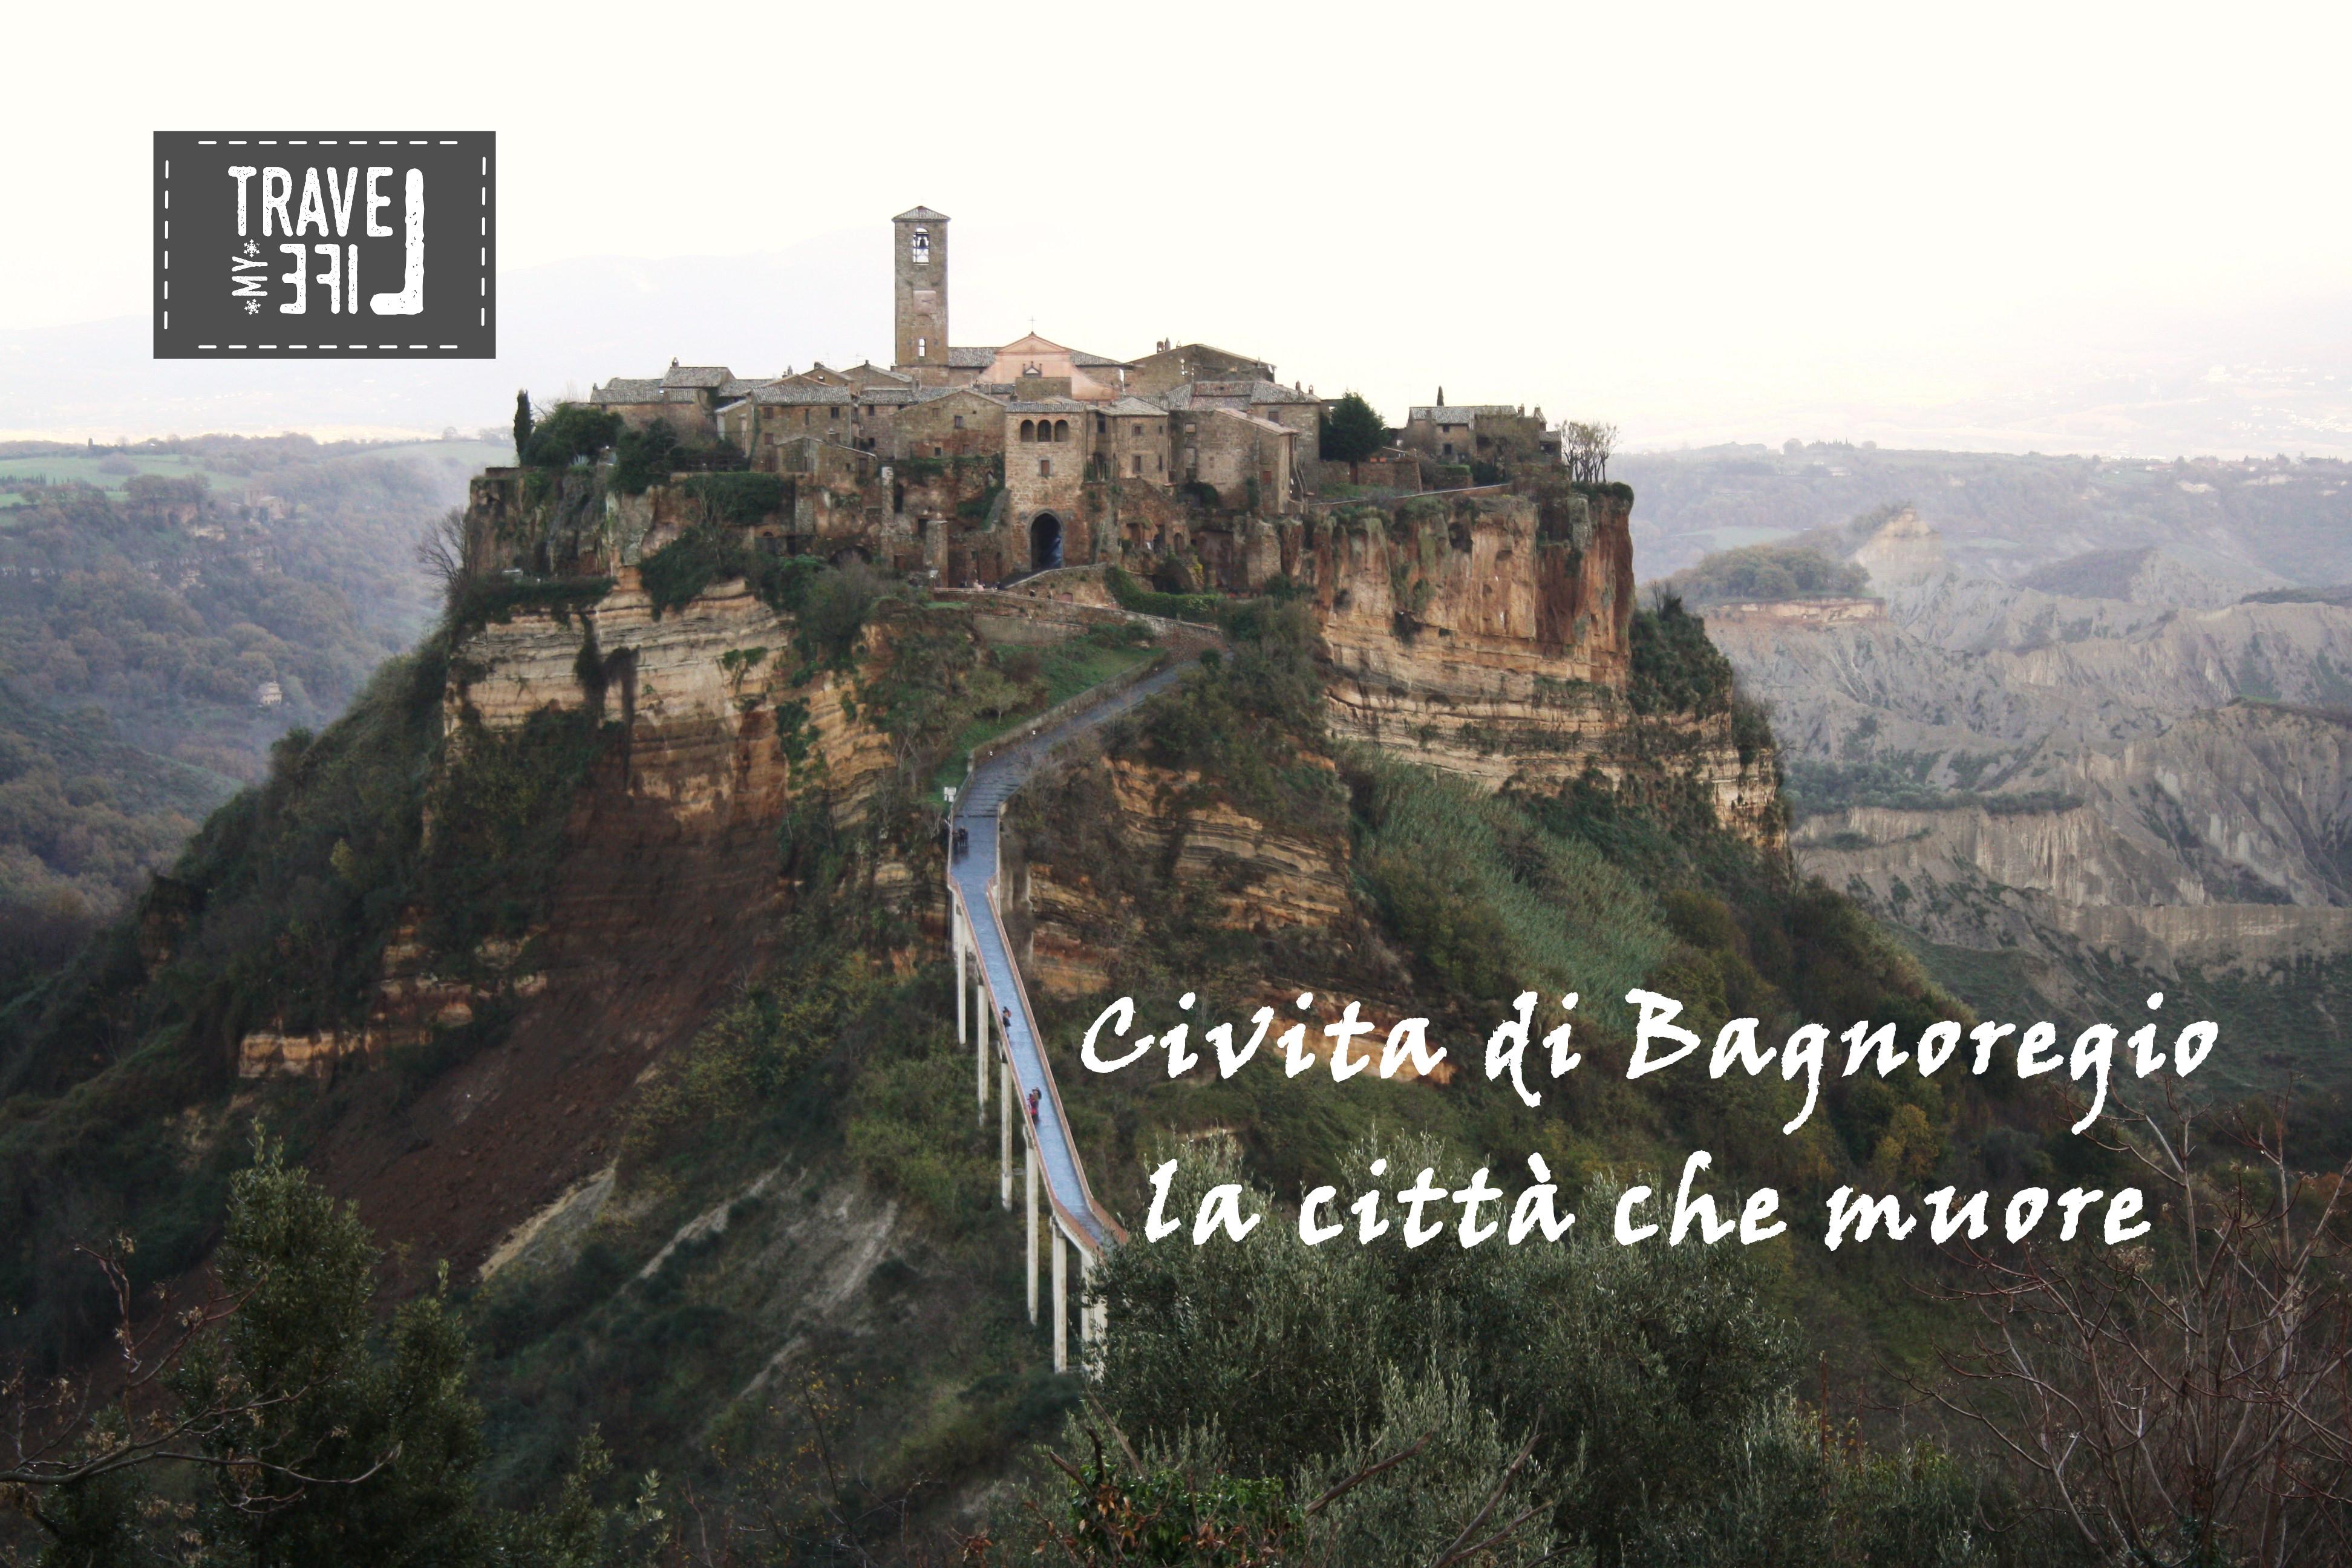 civita_di bagnoregio_mytravelife_1